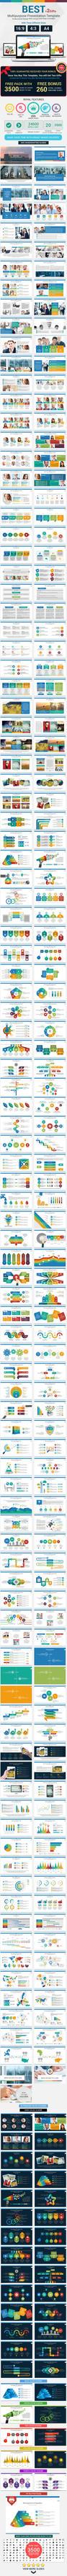 Best PowerPoint Presentation Template by yekpix